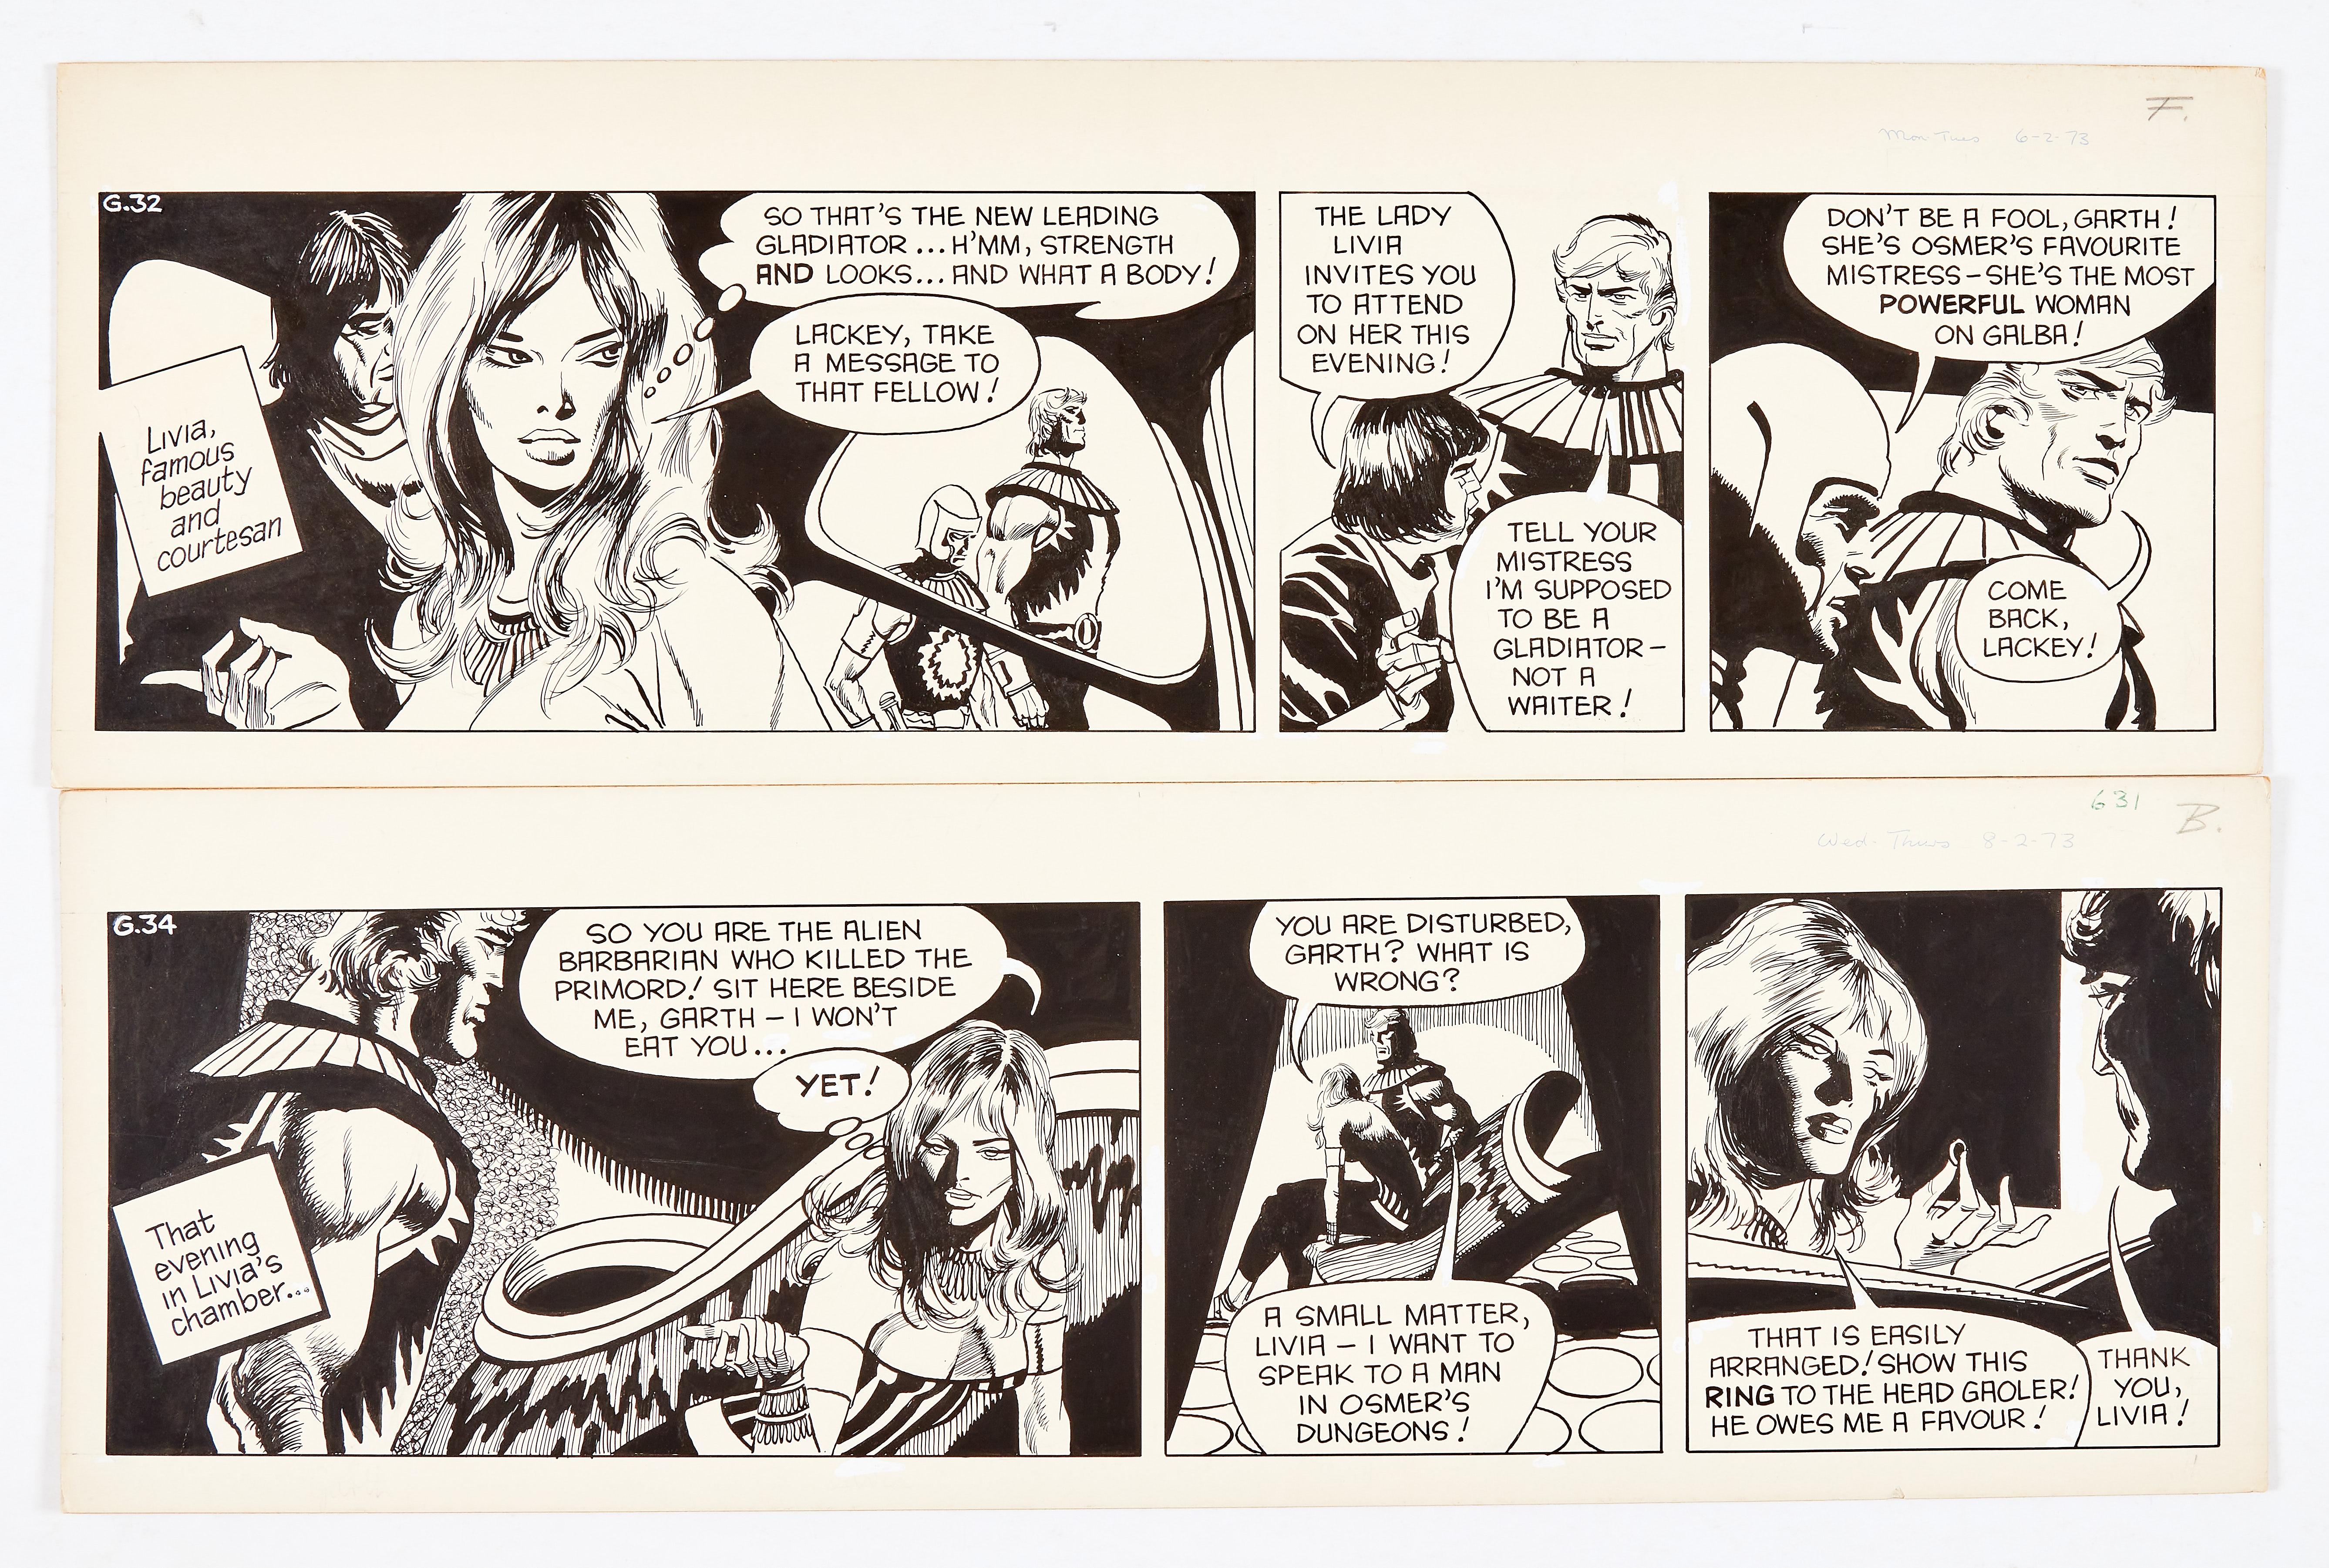 Garth: 'Women of Galba' two original artworks (1973) by Frank Bellamy for the Daily Mirror 6/8